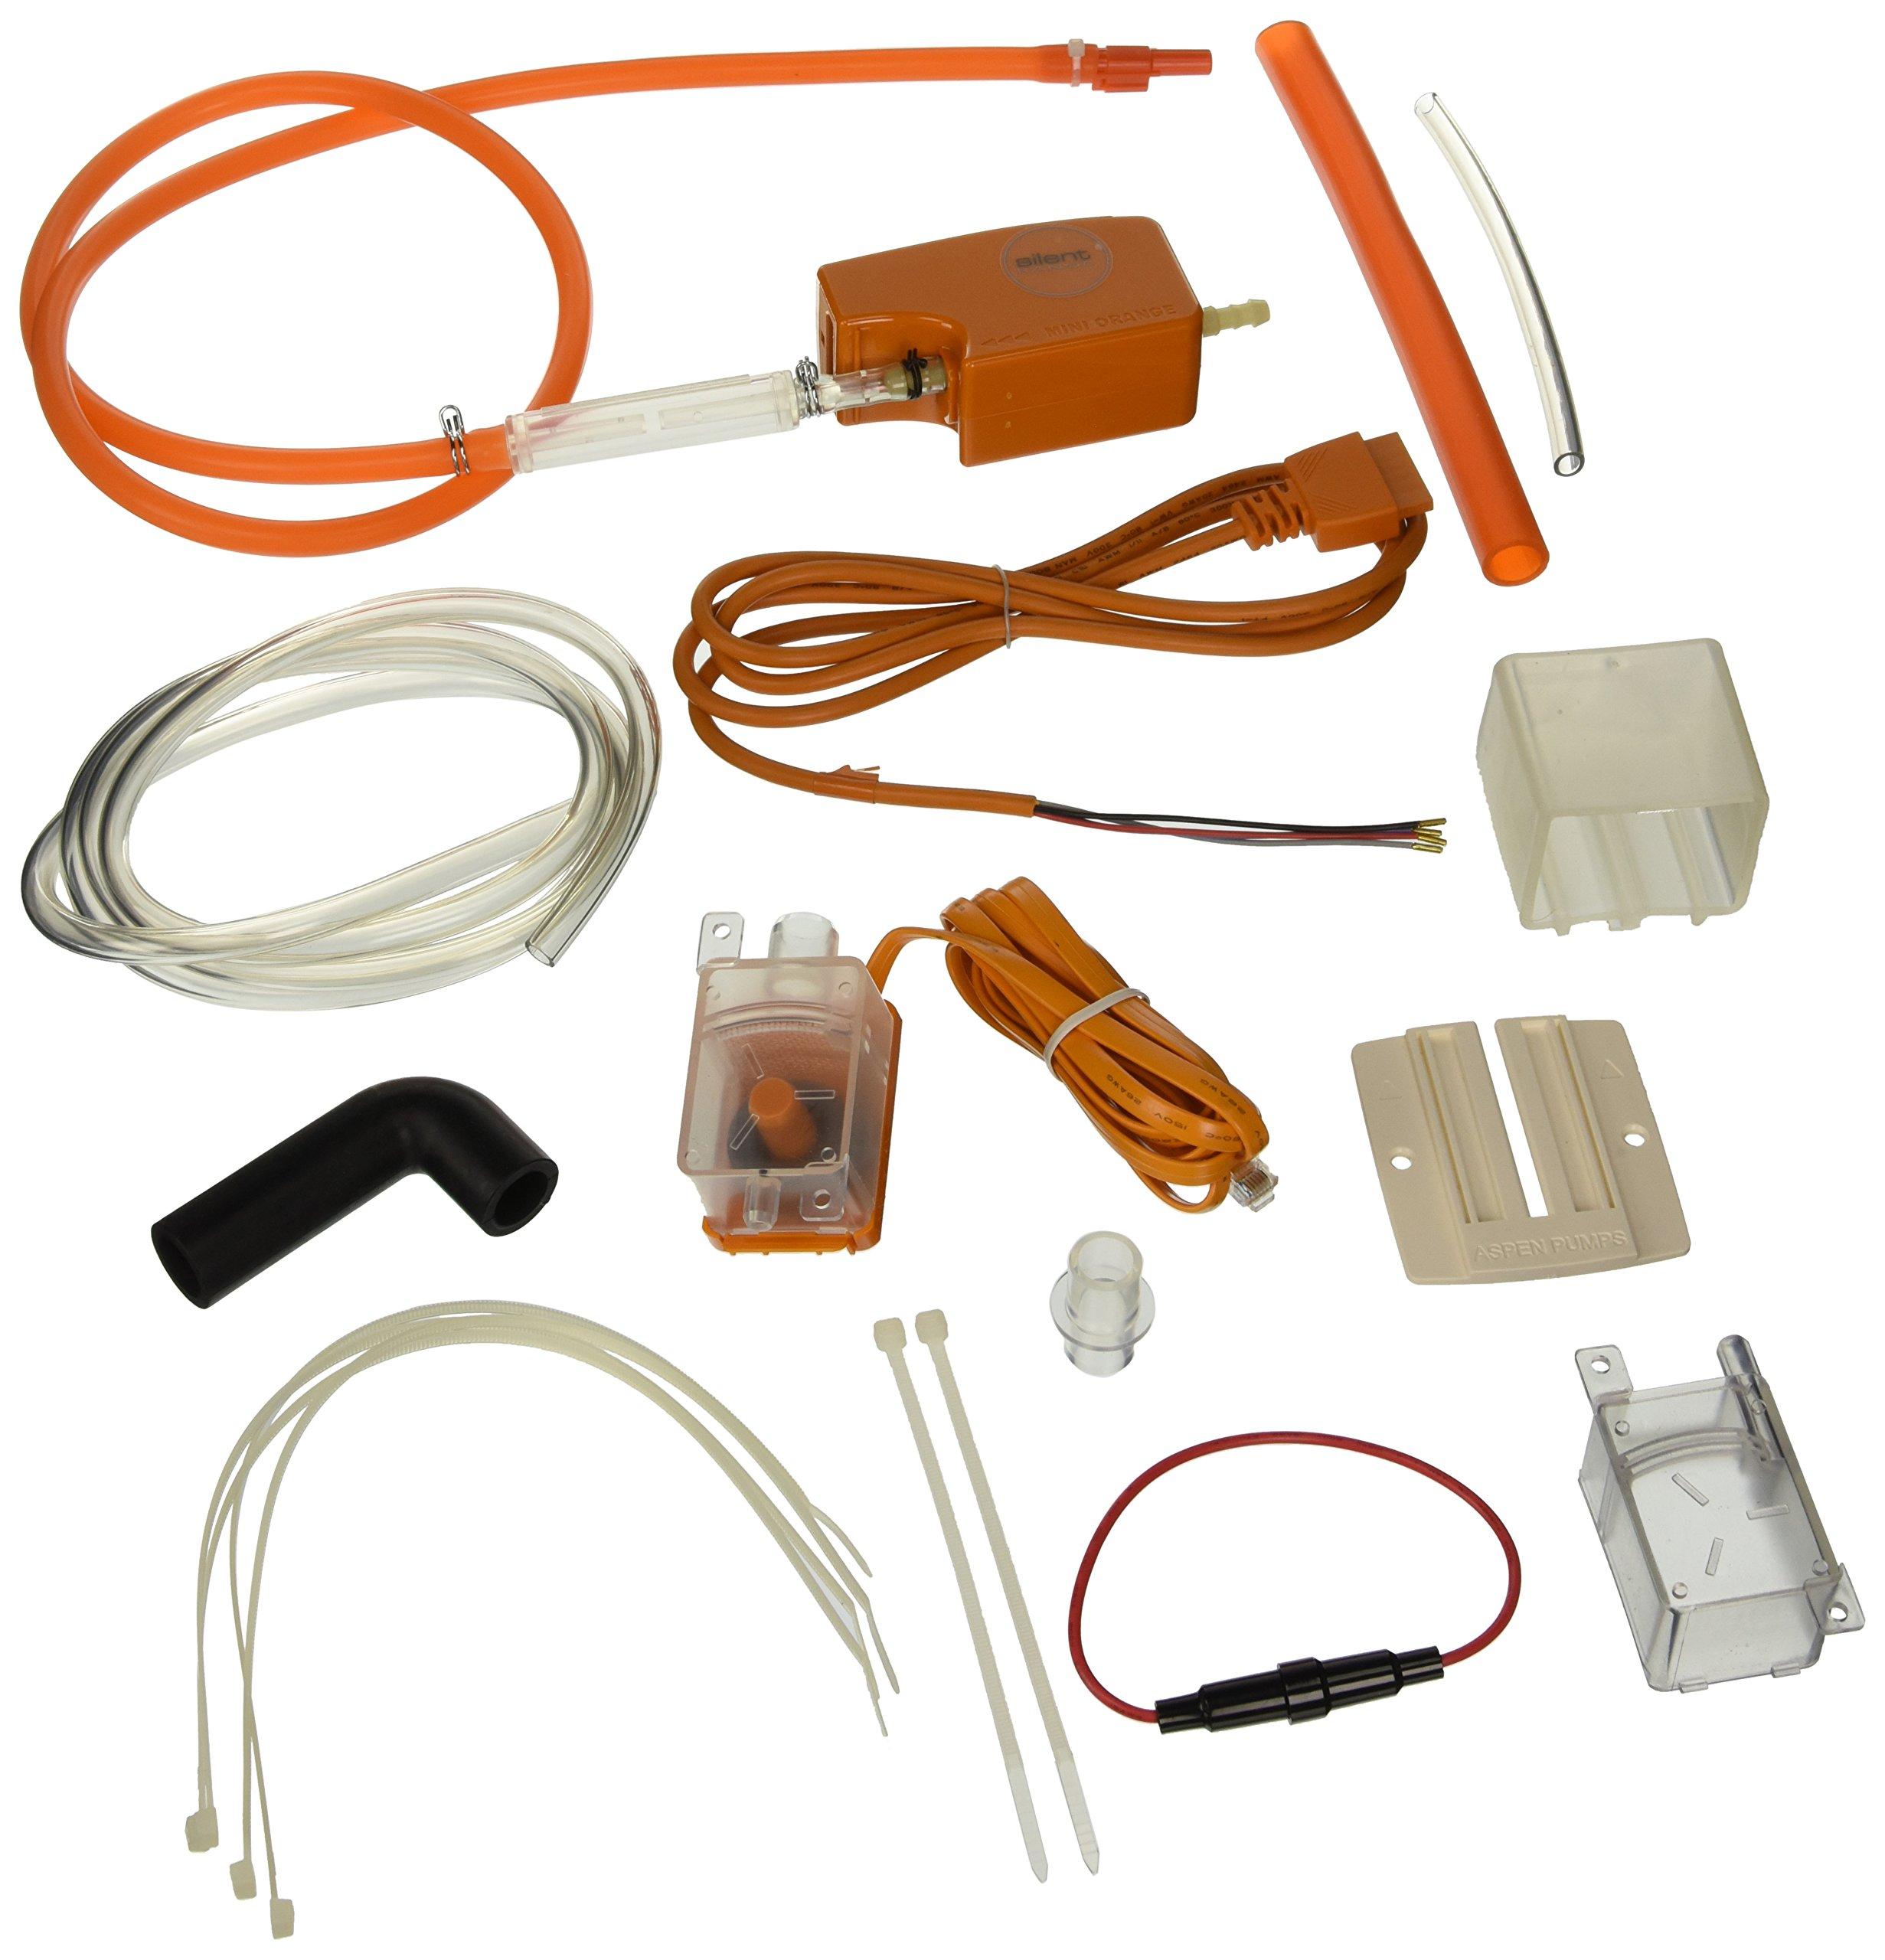 Rectorseal 83912 Aspen Mini Orange 230V Condensate Pump Silent Plus by Rectorseal (Image #1)